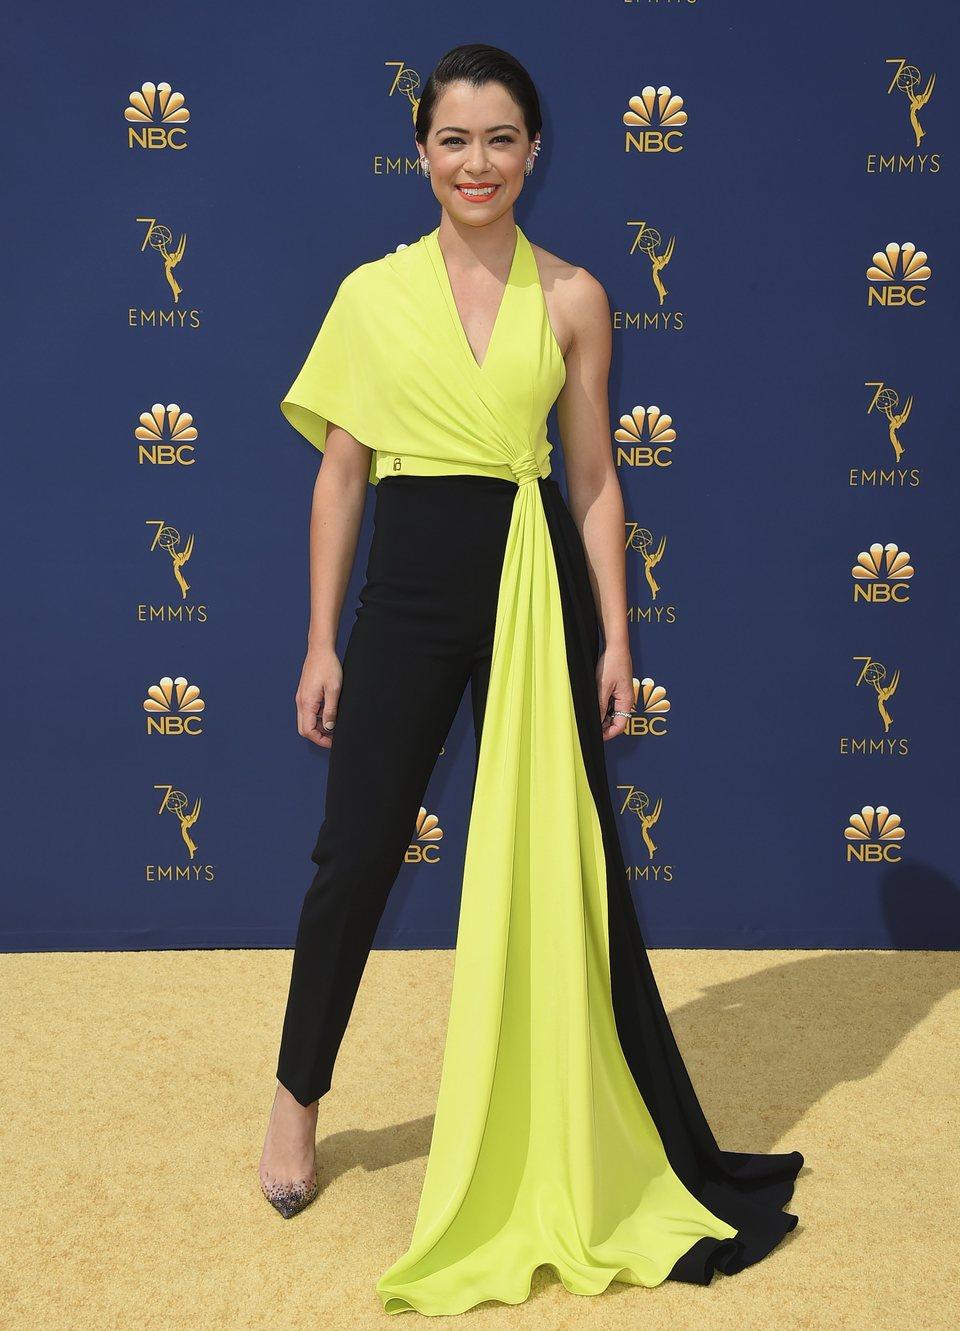 Tatiana Maslany on the red carpet at the Emmys 2018